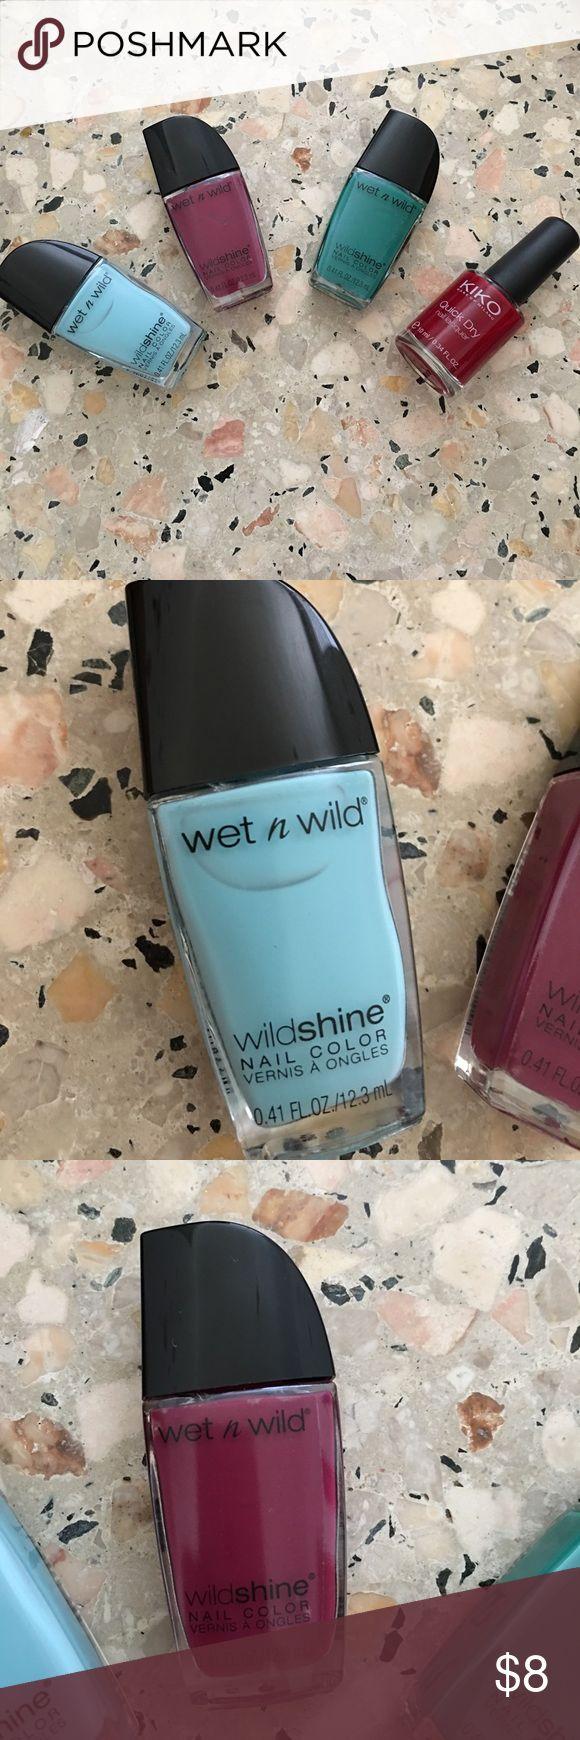 Nail polish bundle 3 Wet n'Wild nail polishes and a Kiko Milano quick dry nail polish. wet n wild Other